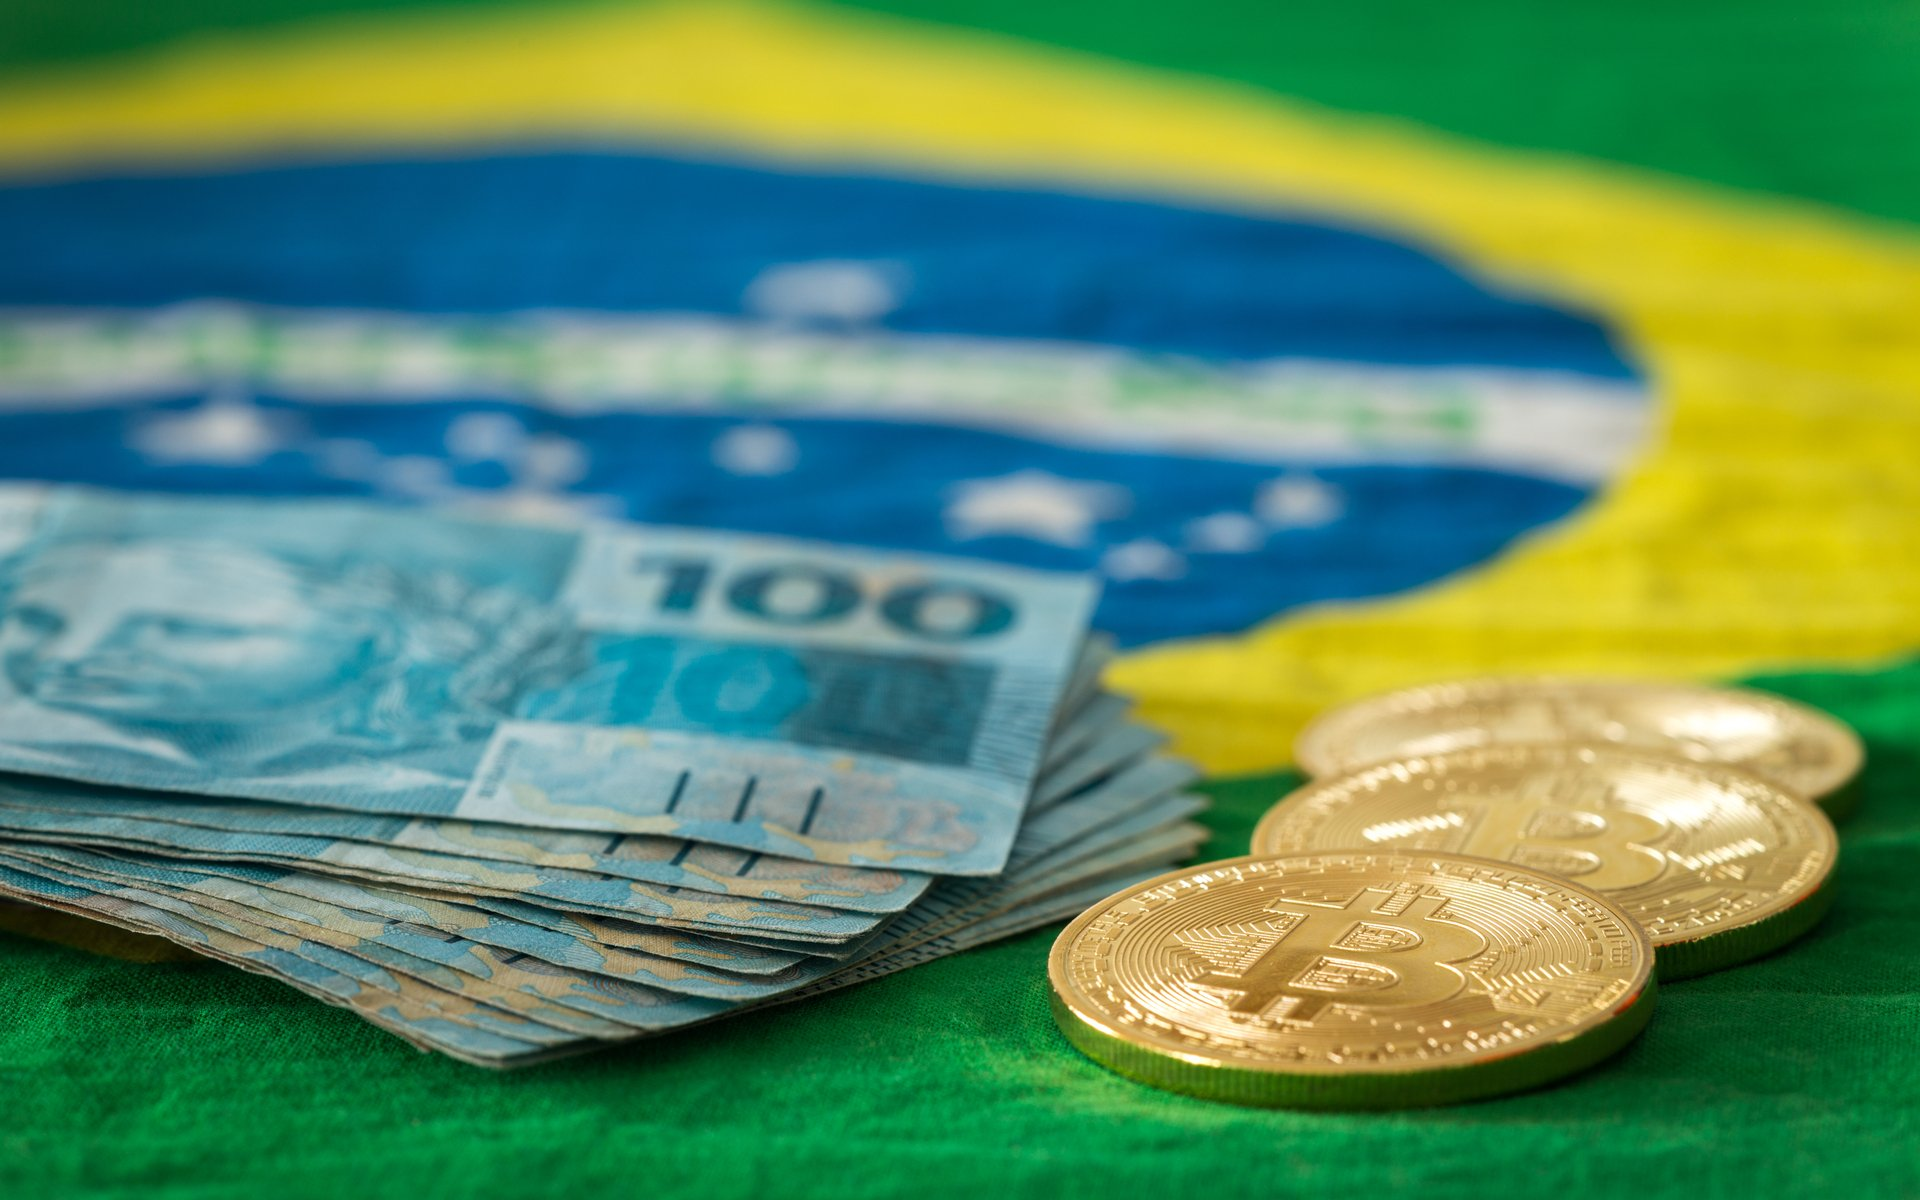 Brazilian Brokerage XP Eyes a $2.1 Billion IPO on NASDAQ